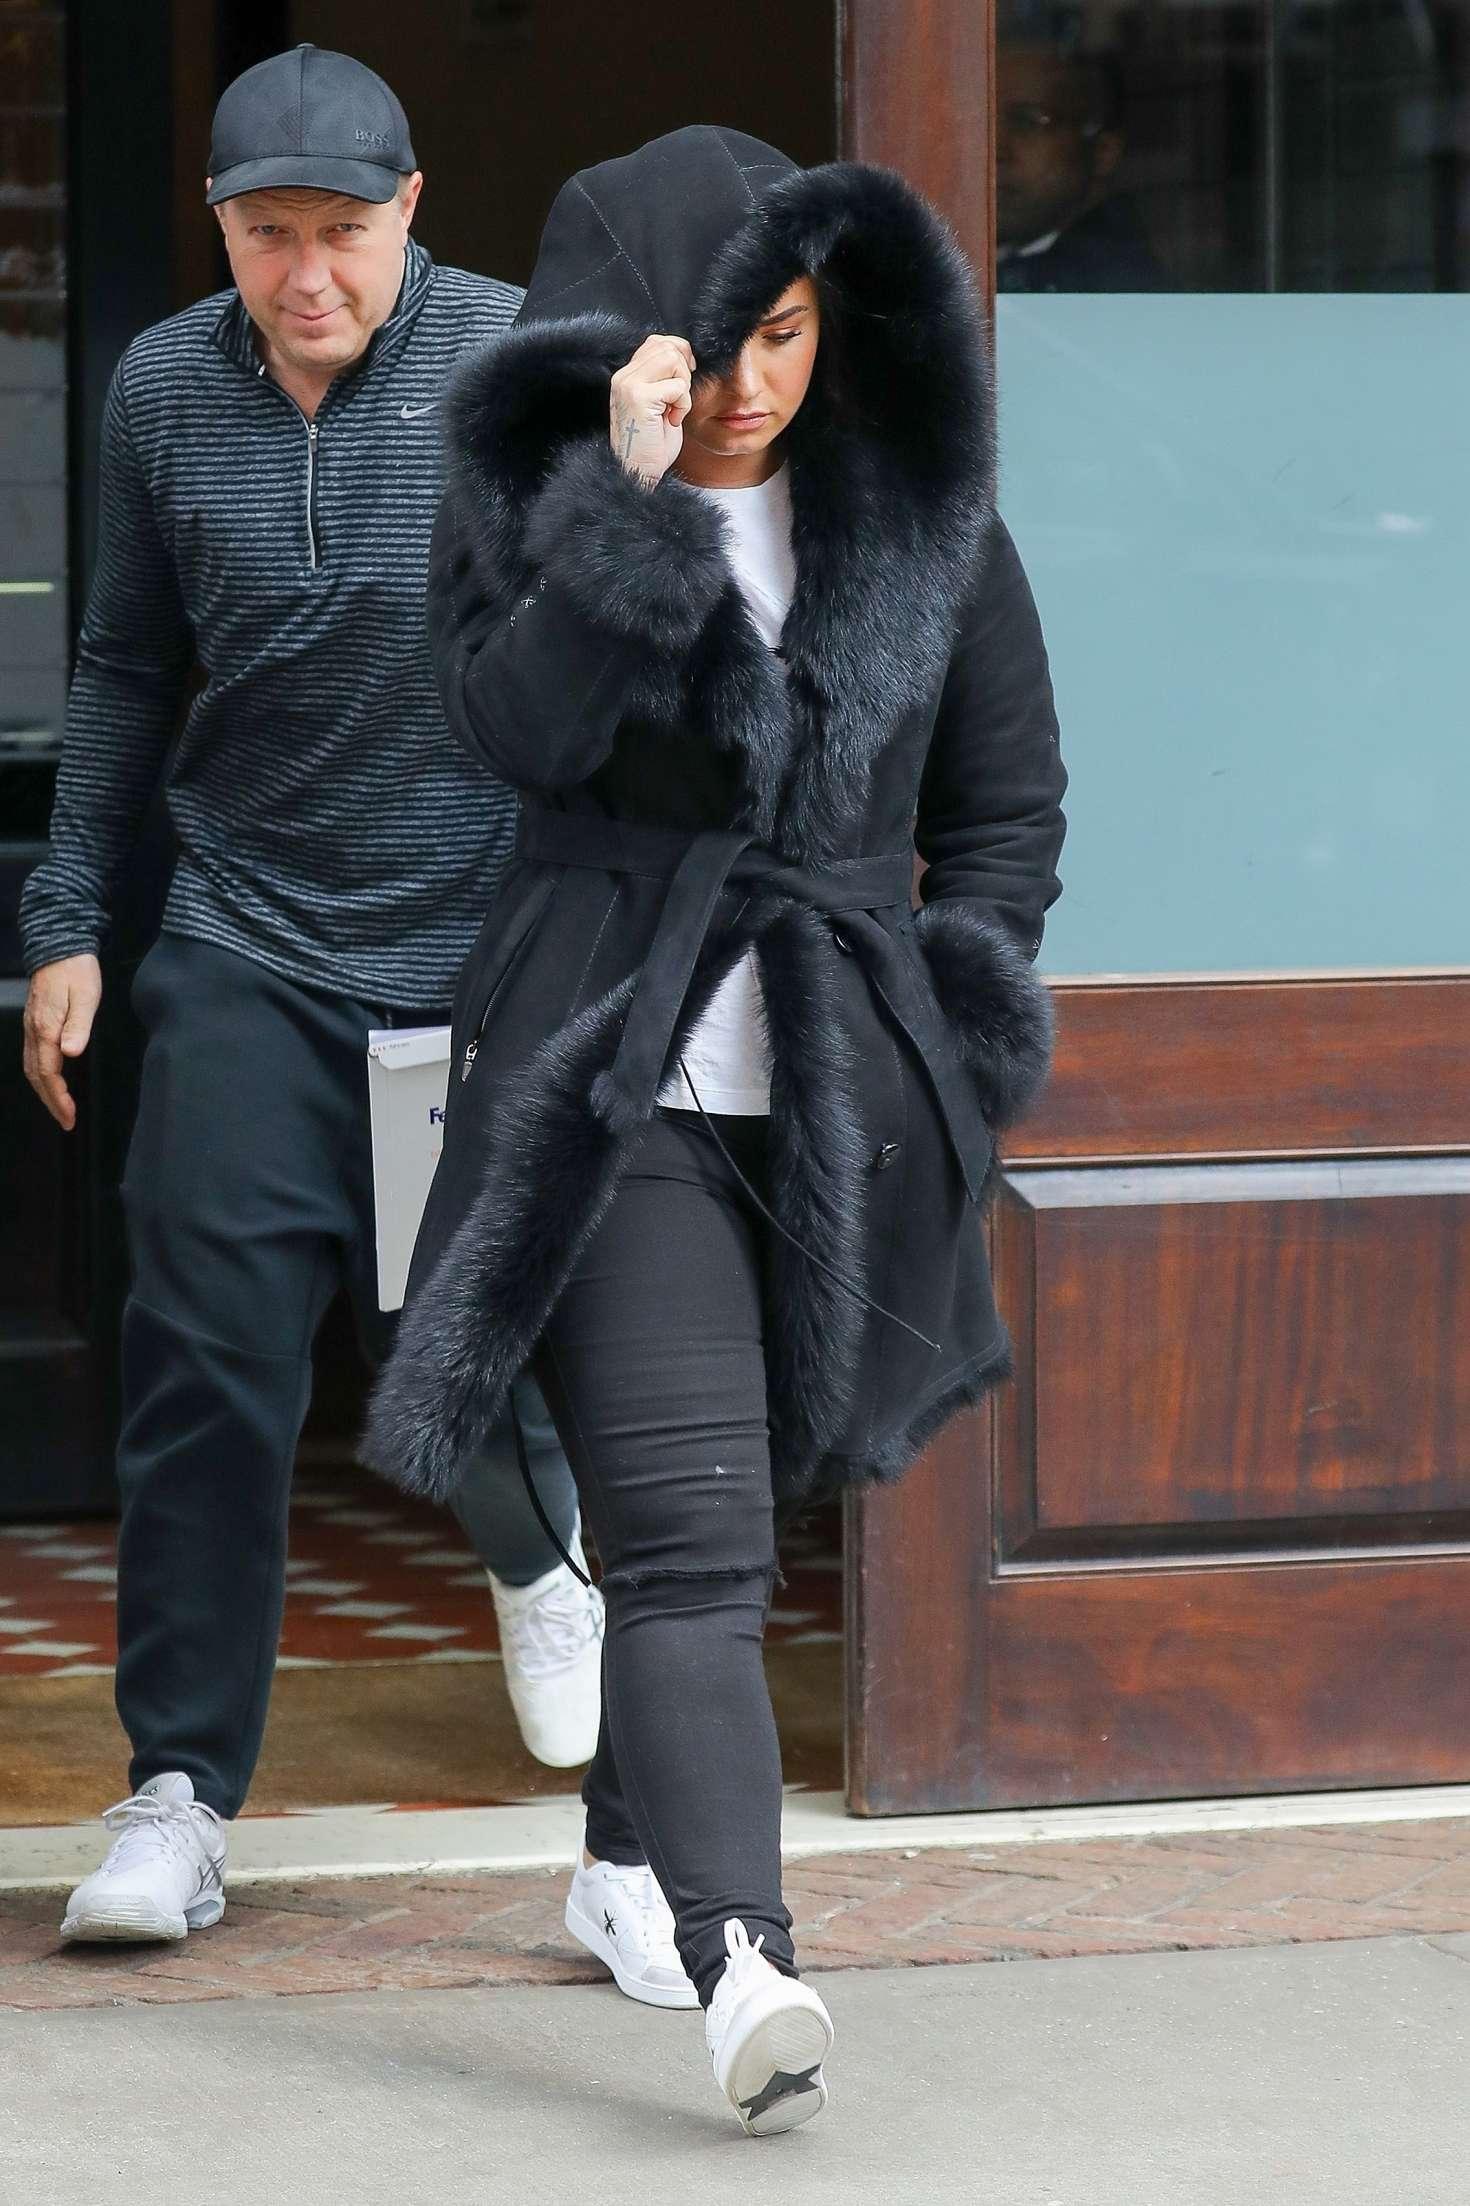 Demi Lovato - Leaving her hotel in NYC